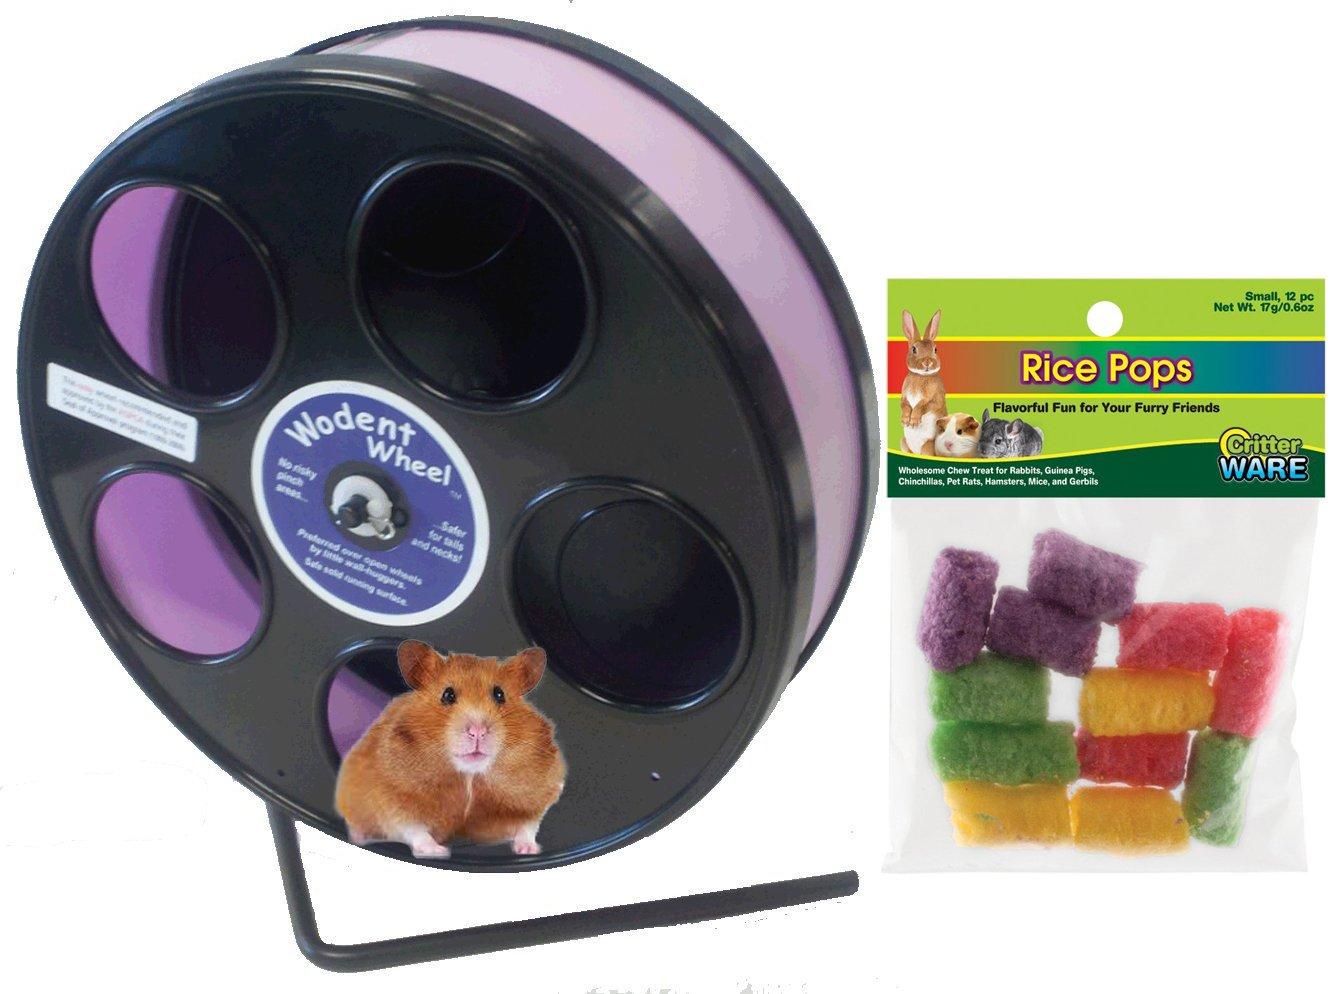 Hamster Wheel 8 inch Transoniq Wodent Wheel Junior, Black with Lavender Track and Ware Rice Pops-Small Animal Treat